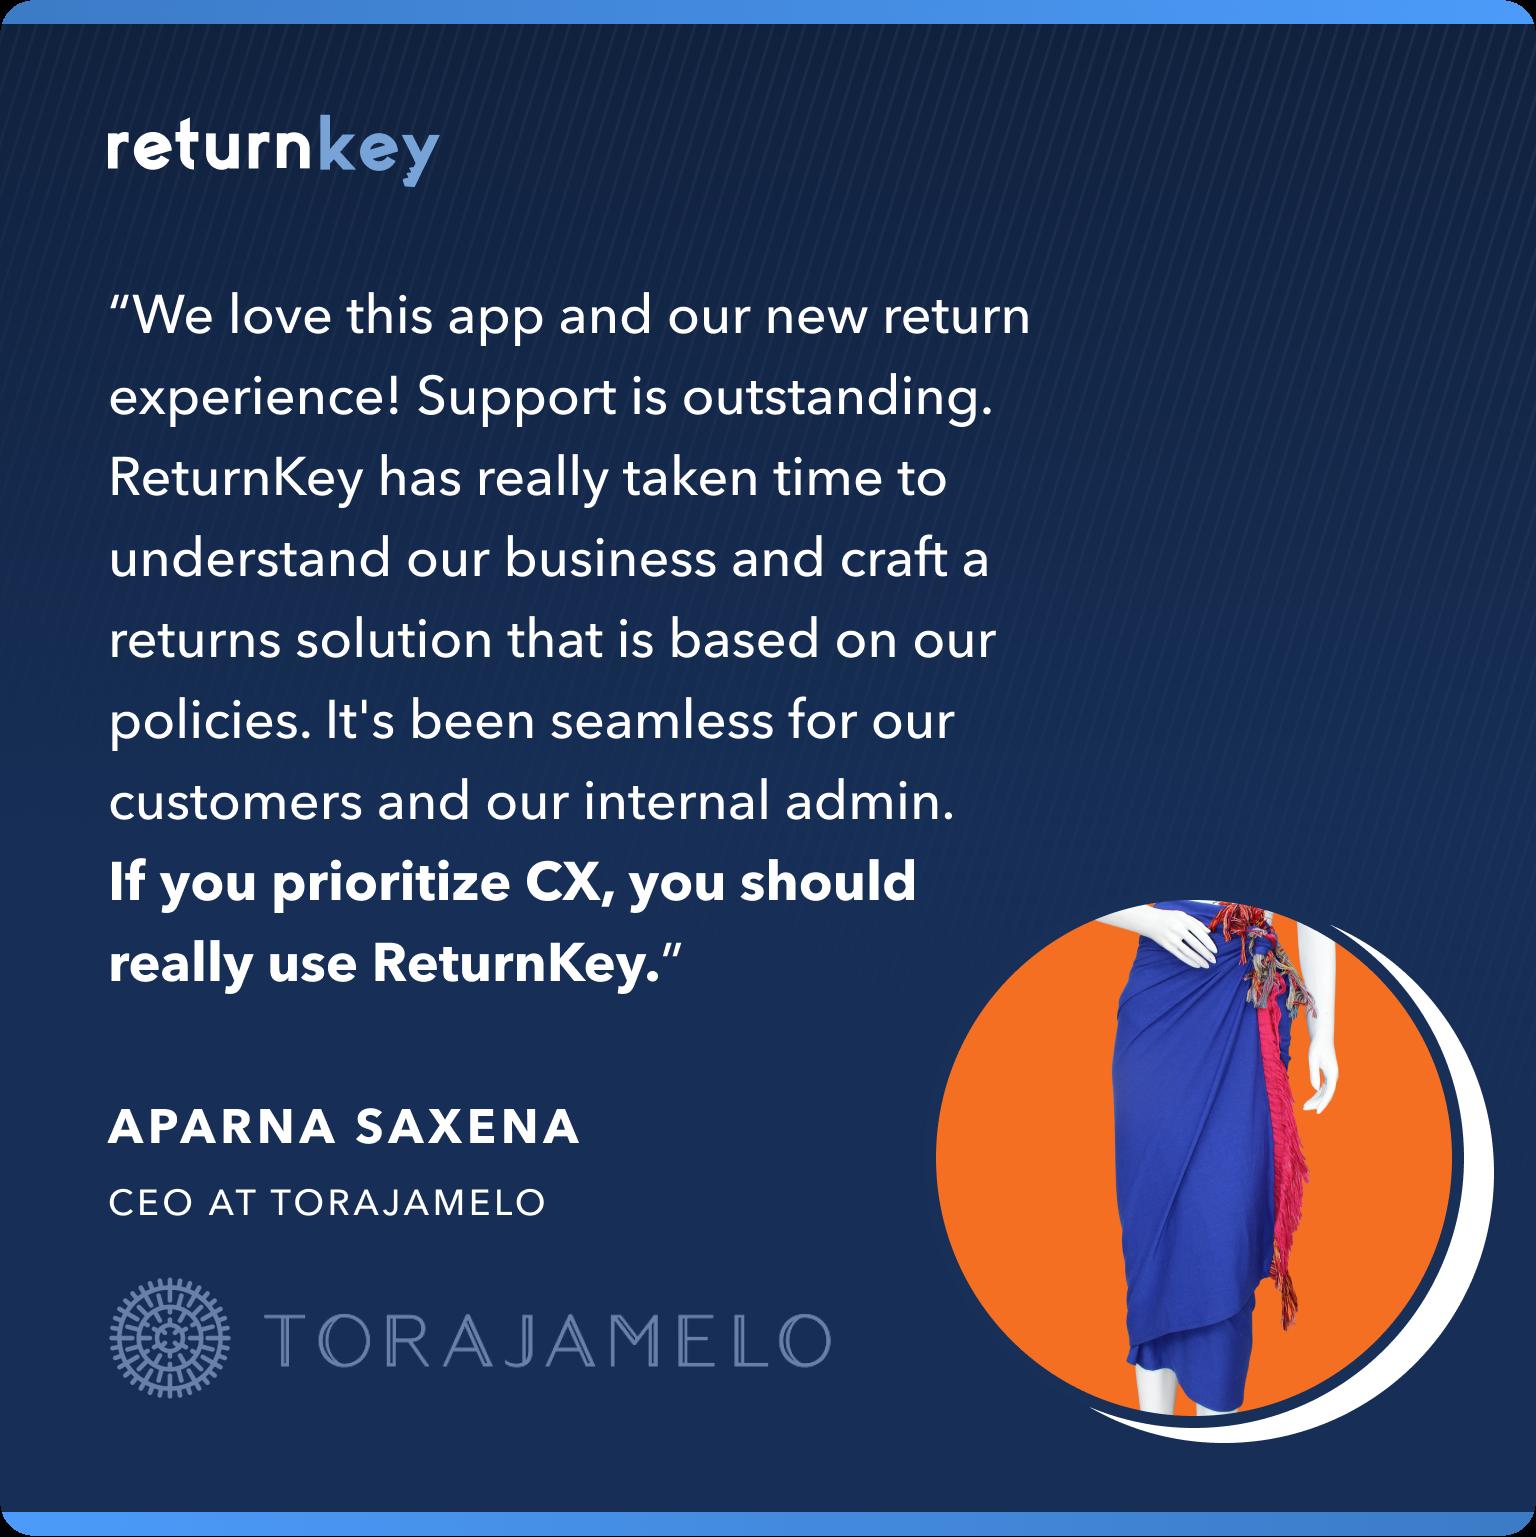 Tora Testimonial for ReturnKey